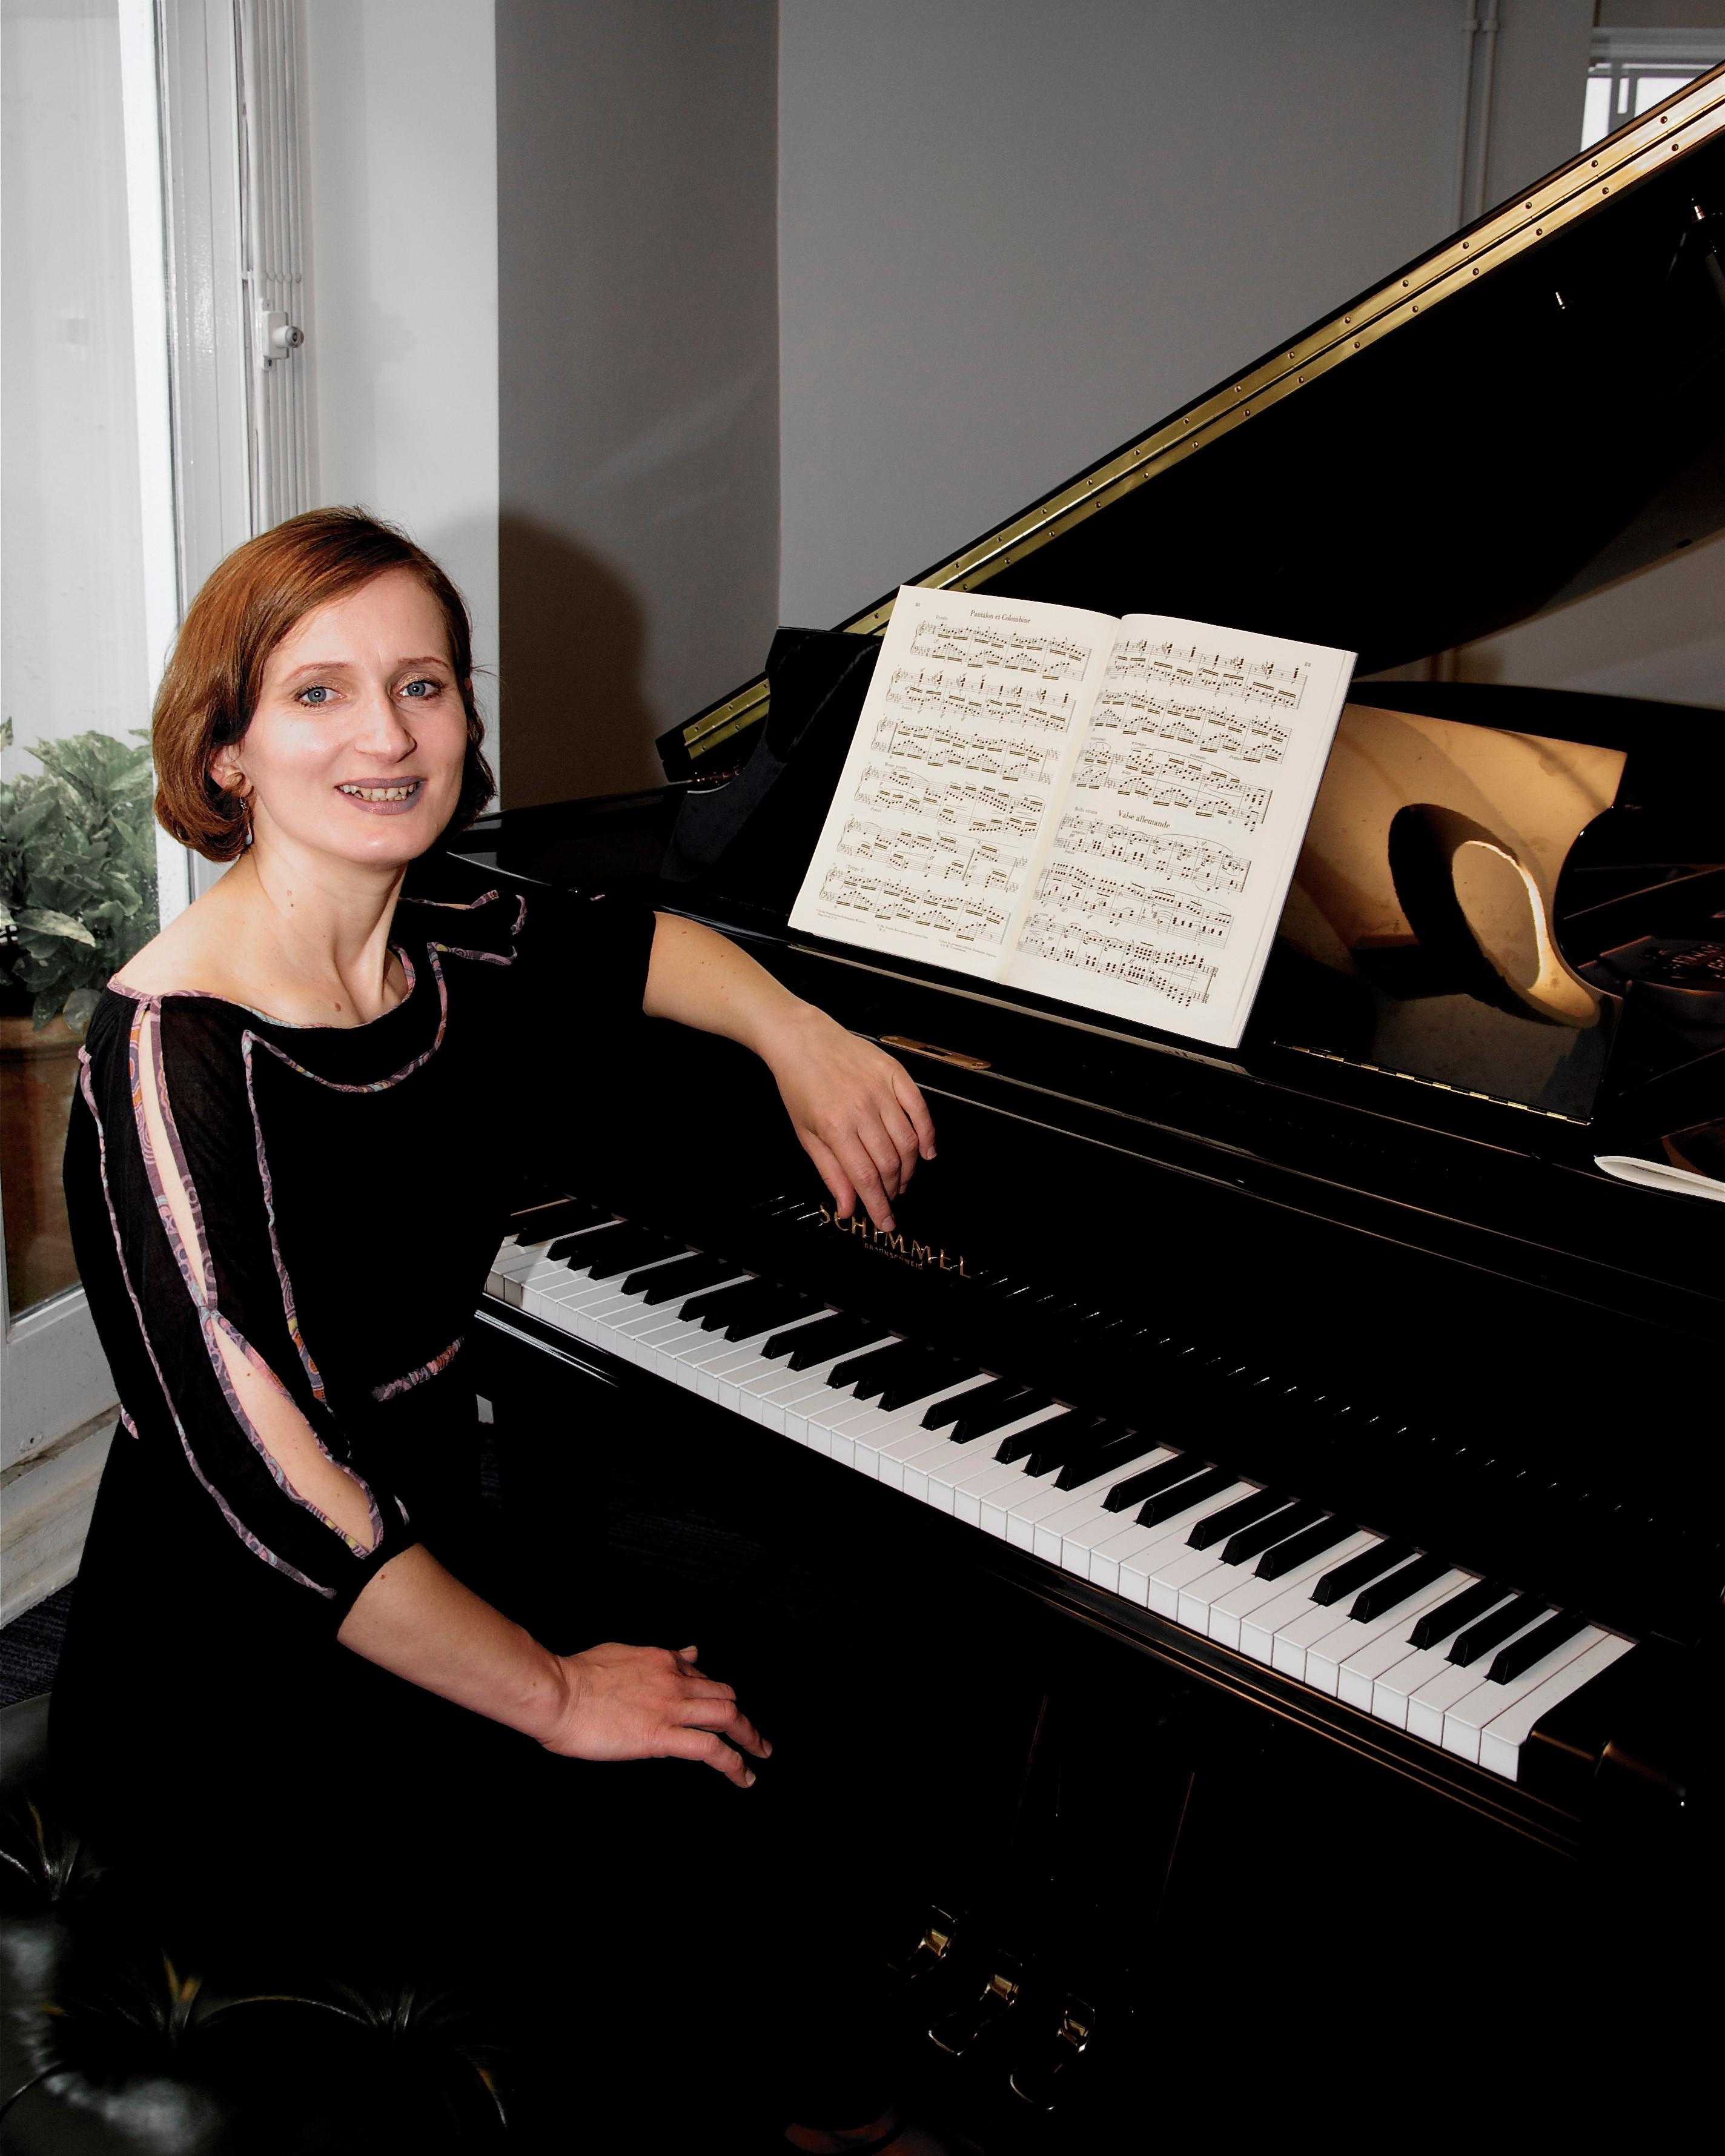 9.30 - 10.00 Piano Summer Term